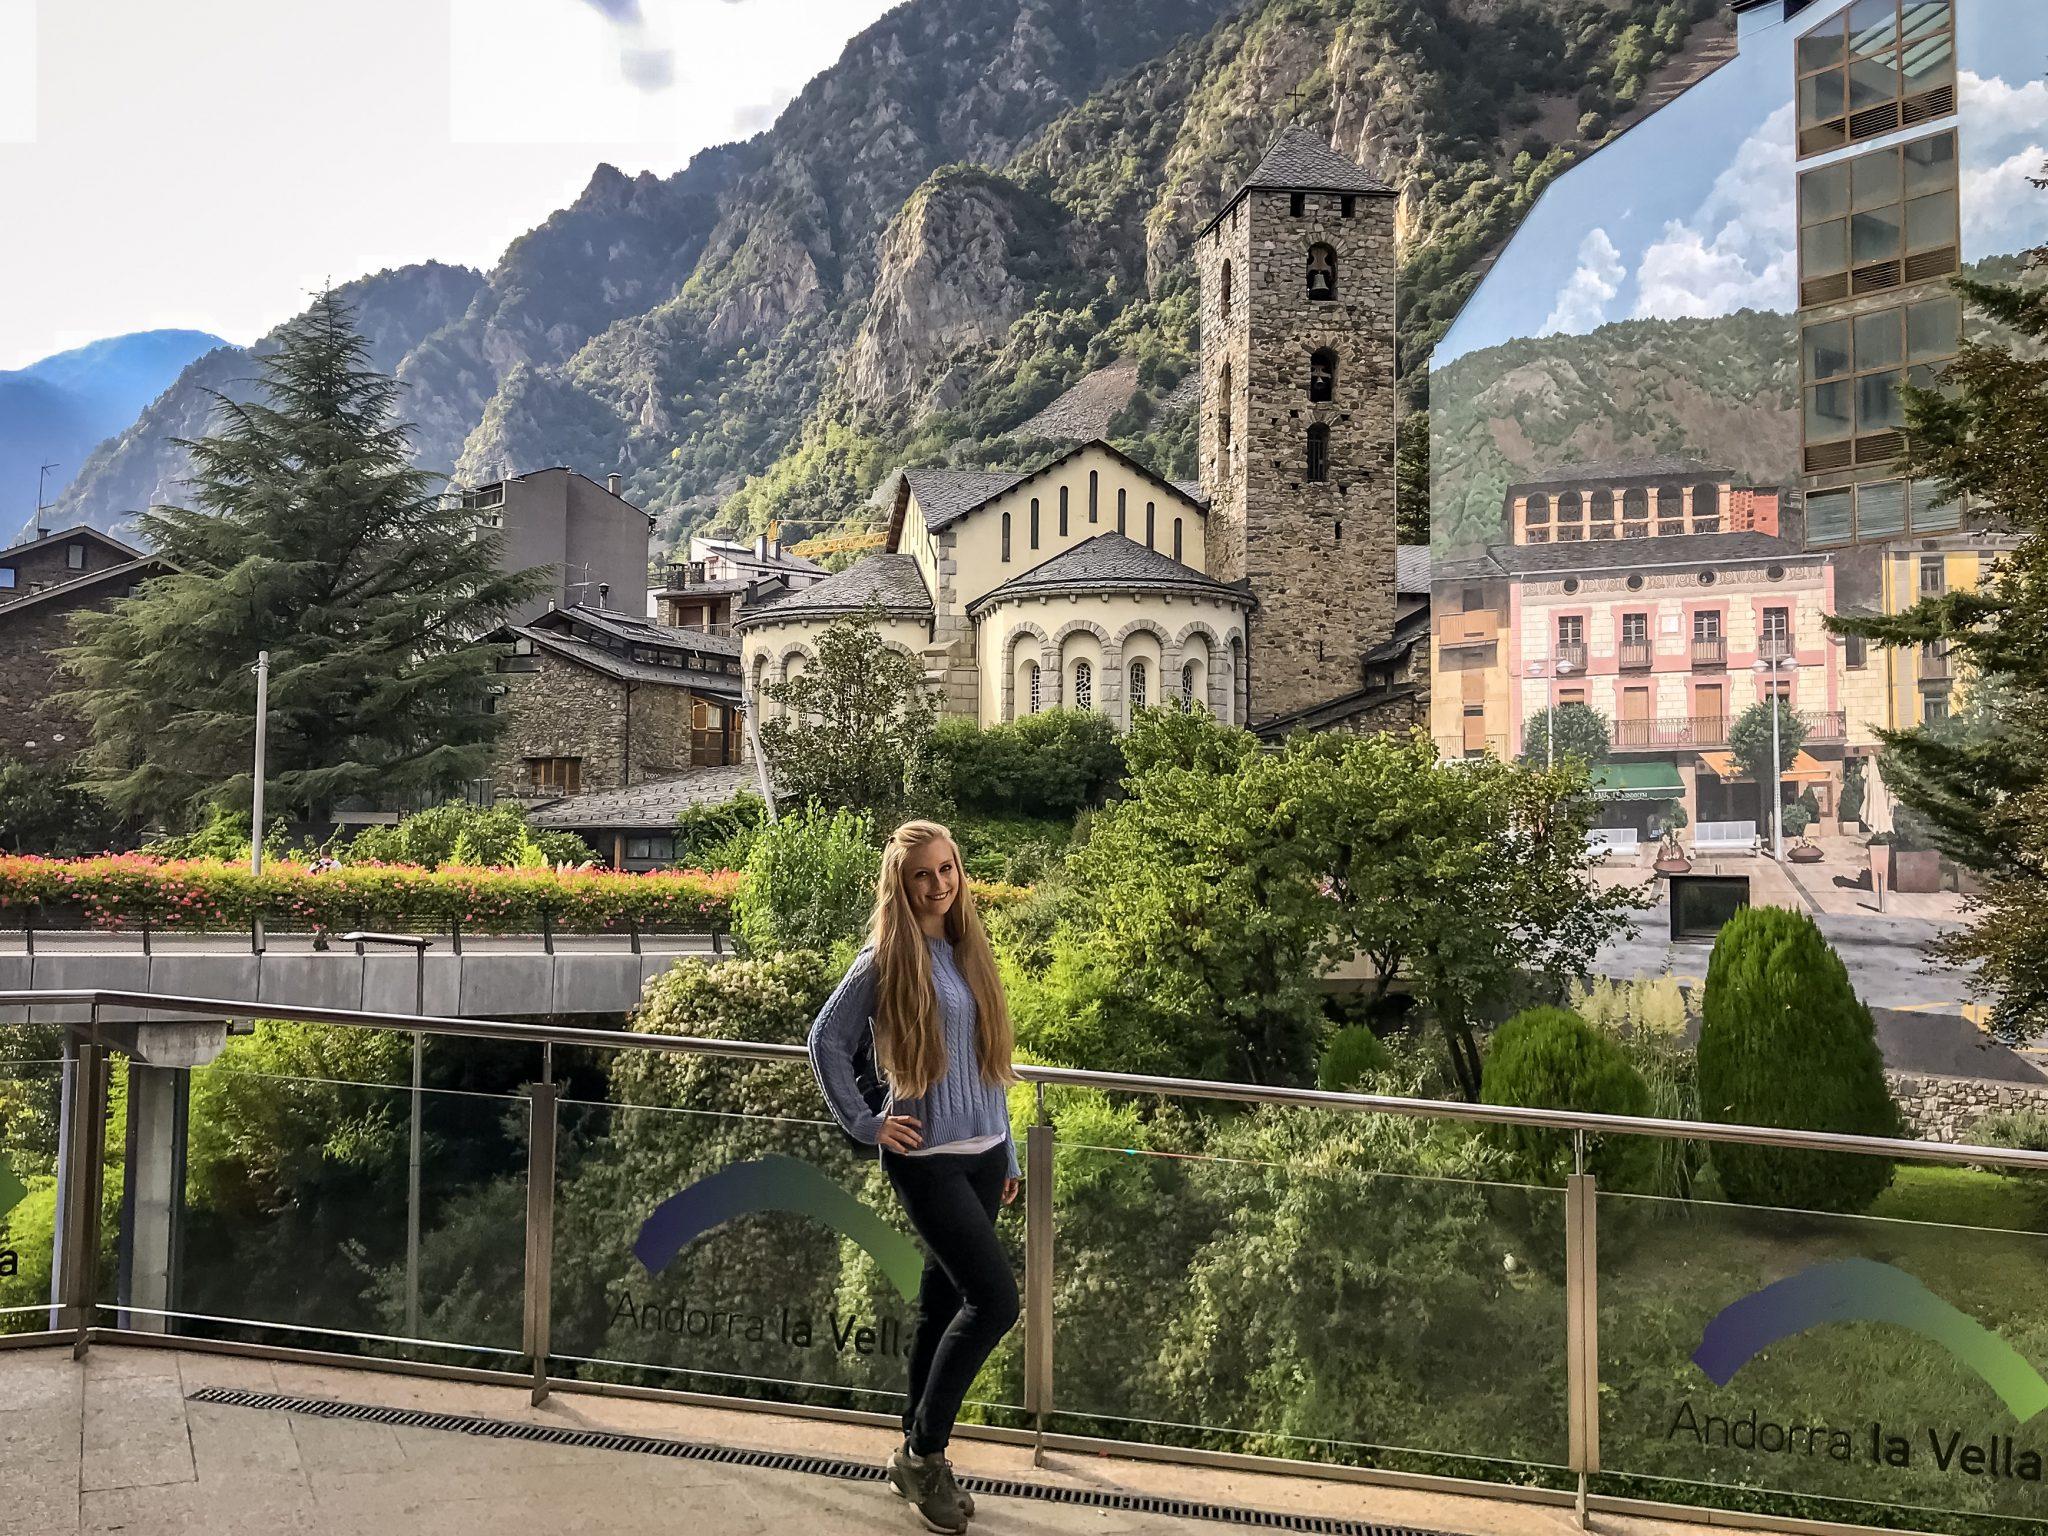 Die Hauptstadt des Landes ist Andorra la Vella.